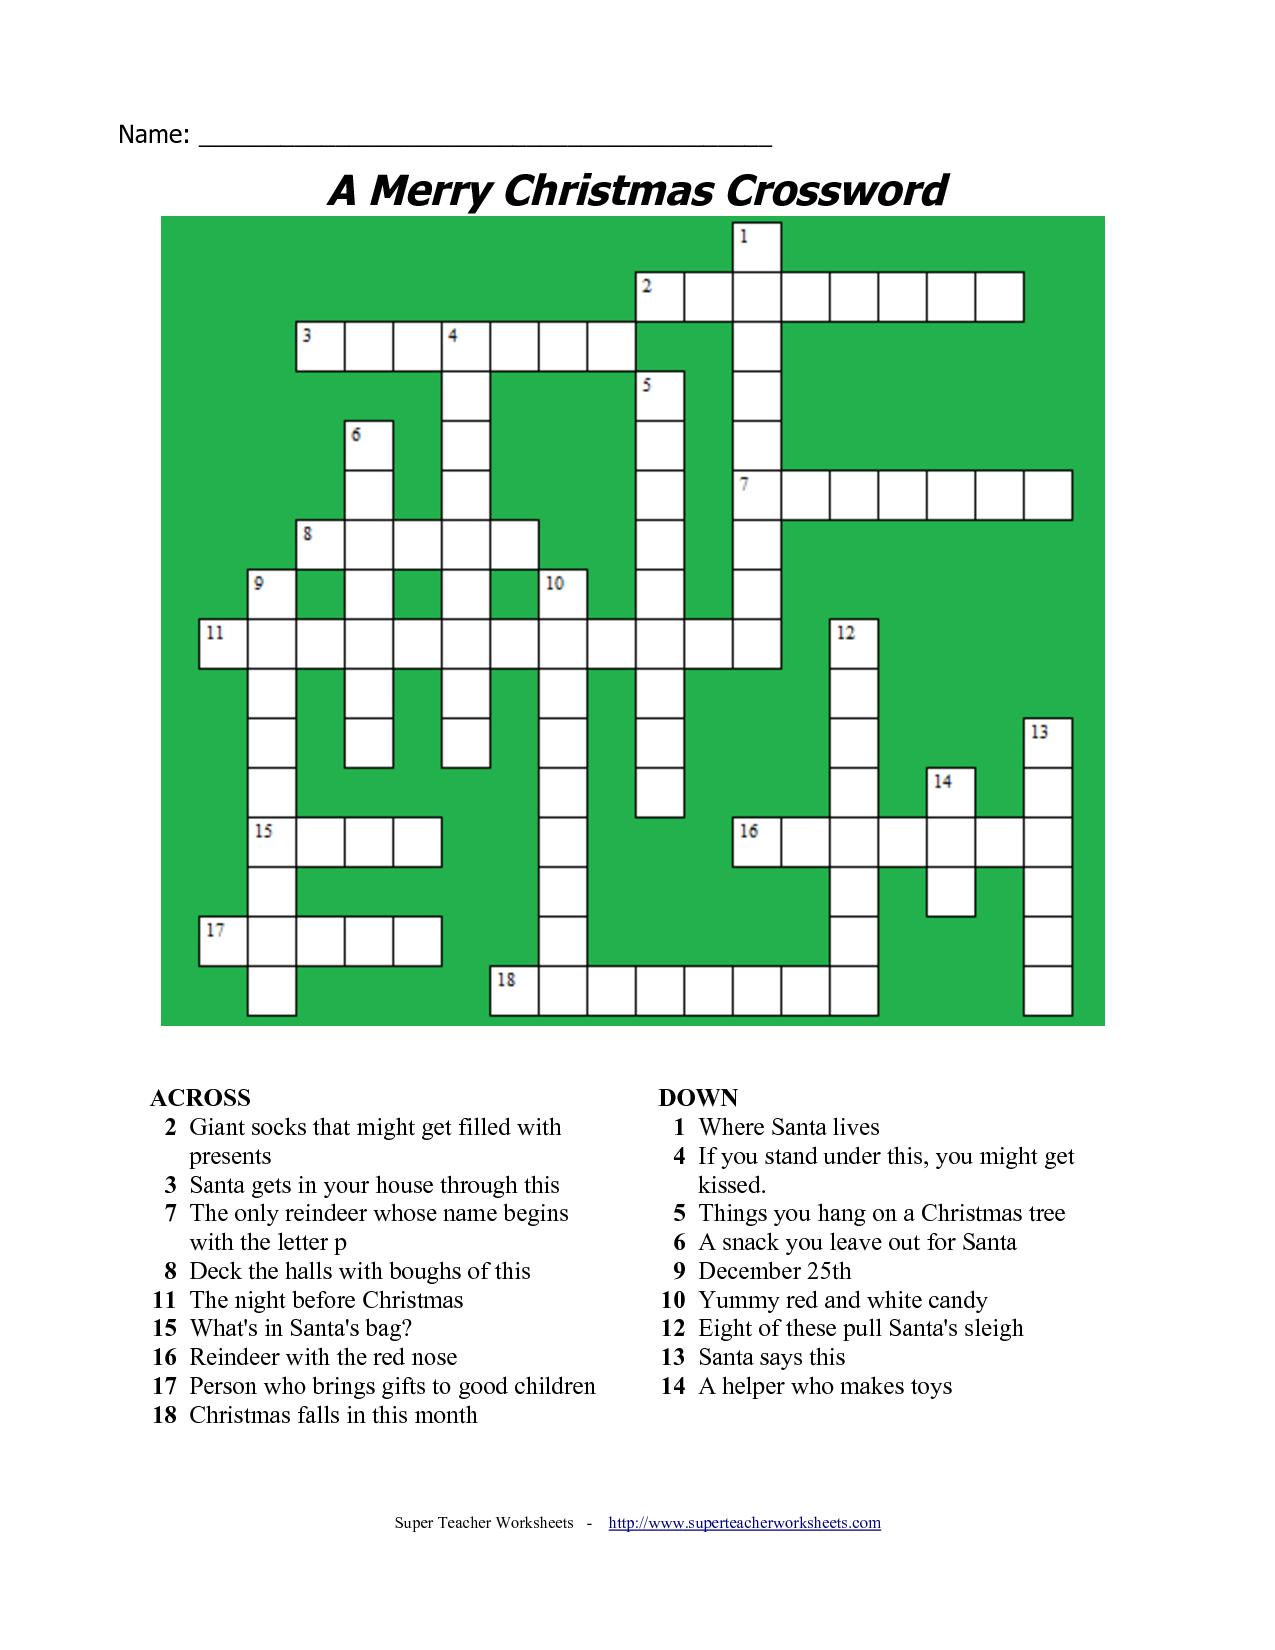 20 Fun Printable Christmas Crossword Puzzles   Kittybabylove - Printable Children's Crossword Puzzles